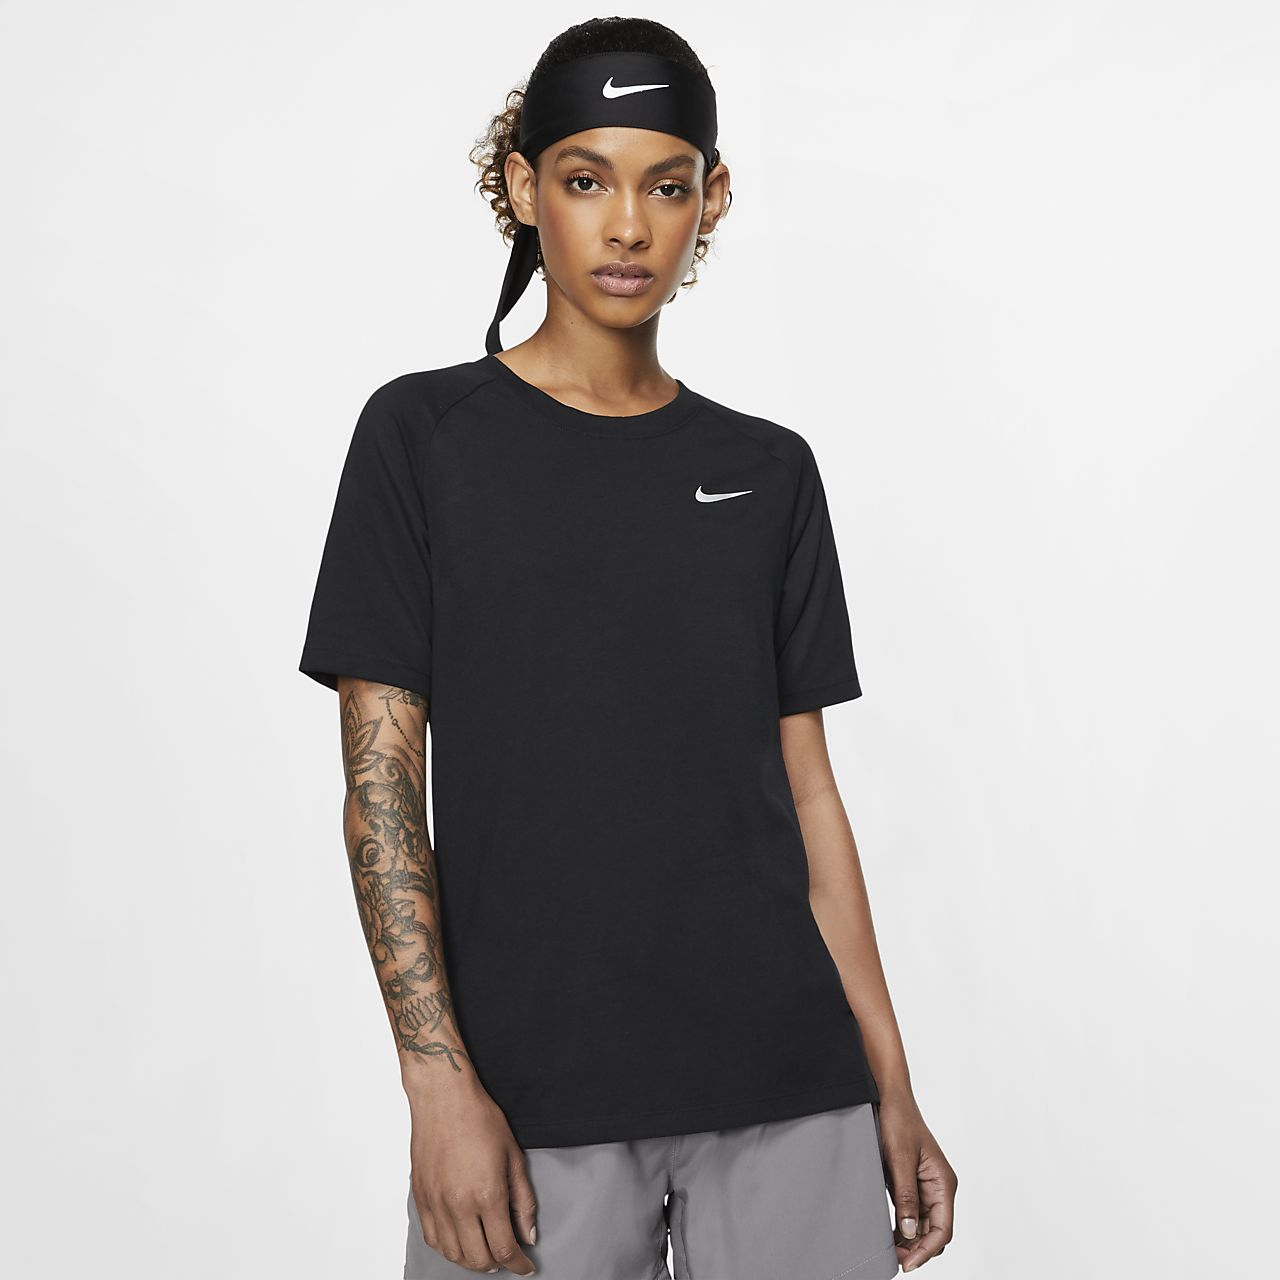 Nike Dri-FIT Tailwind Camiseta de running de manga corta - Mujer ... 8b82d631e197b